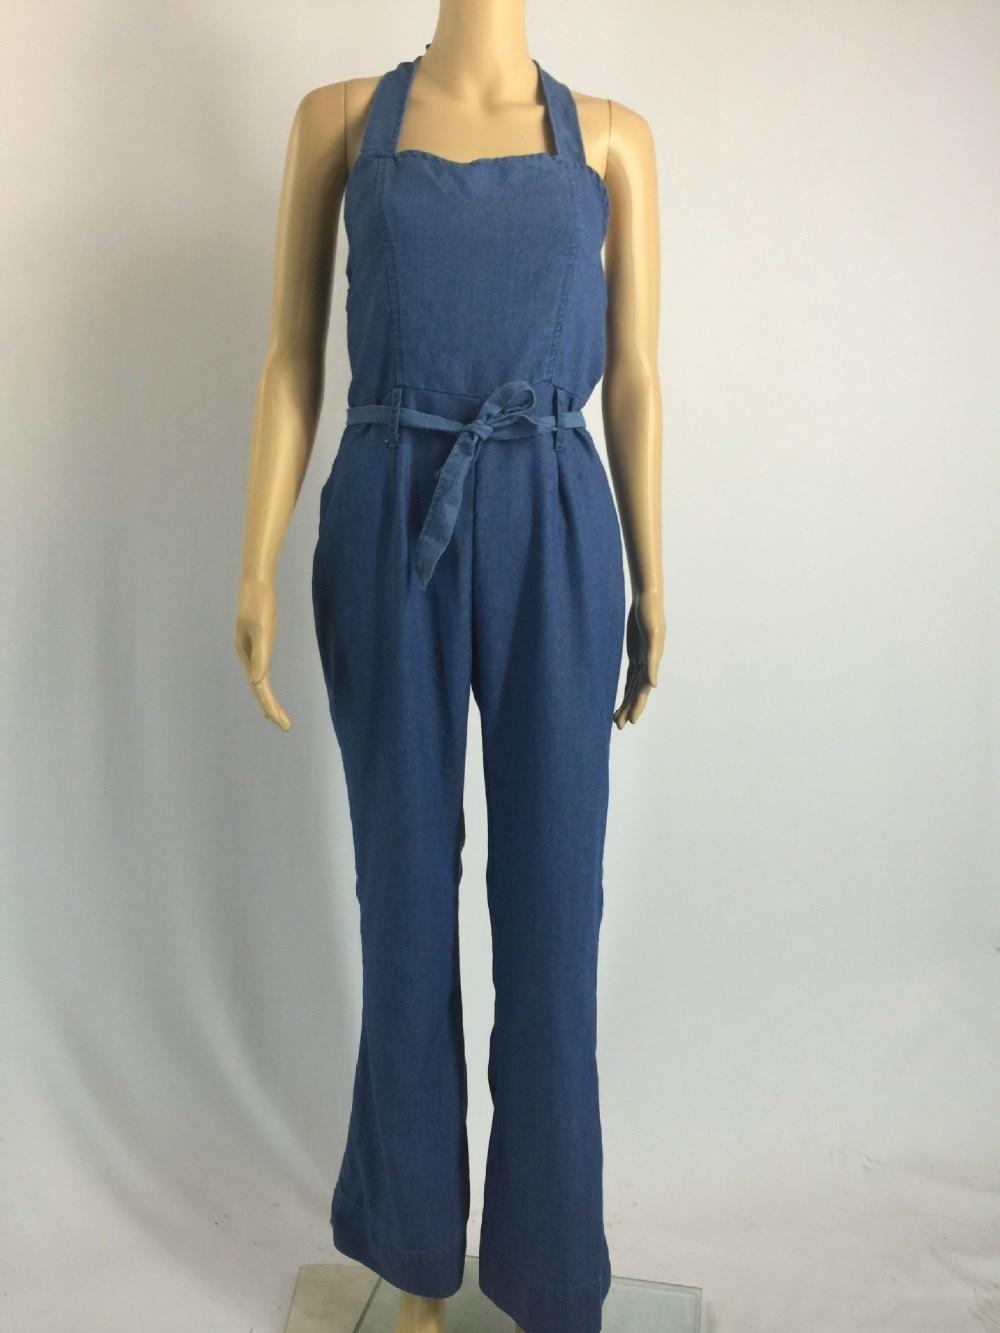 Aliexpress.com : Buy 2016 Casual Rompers Women Jumpsuit Long Pants ...